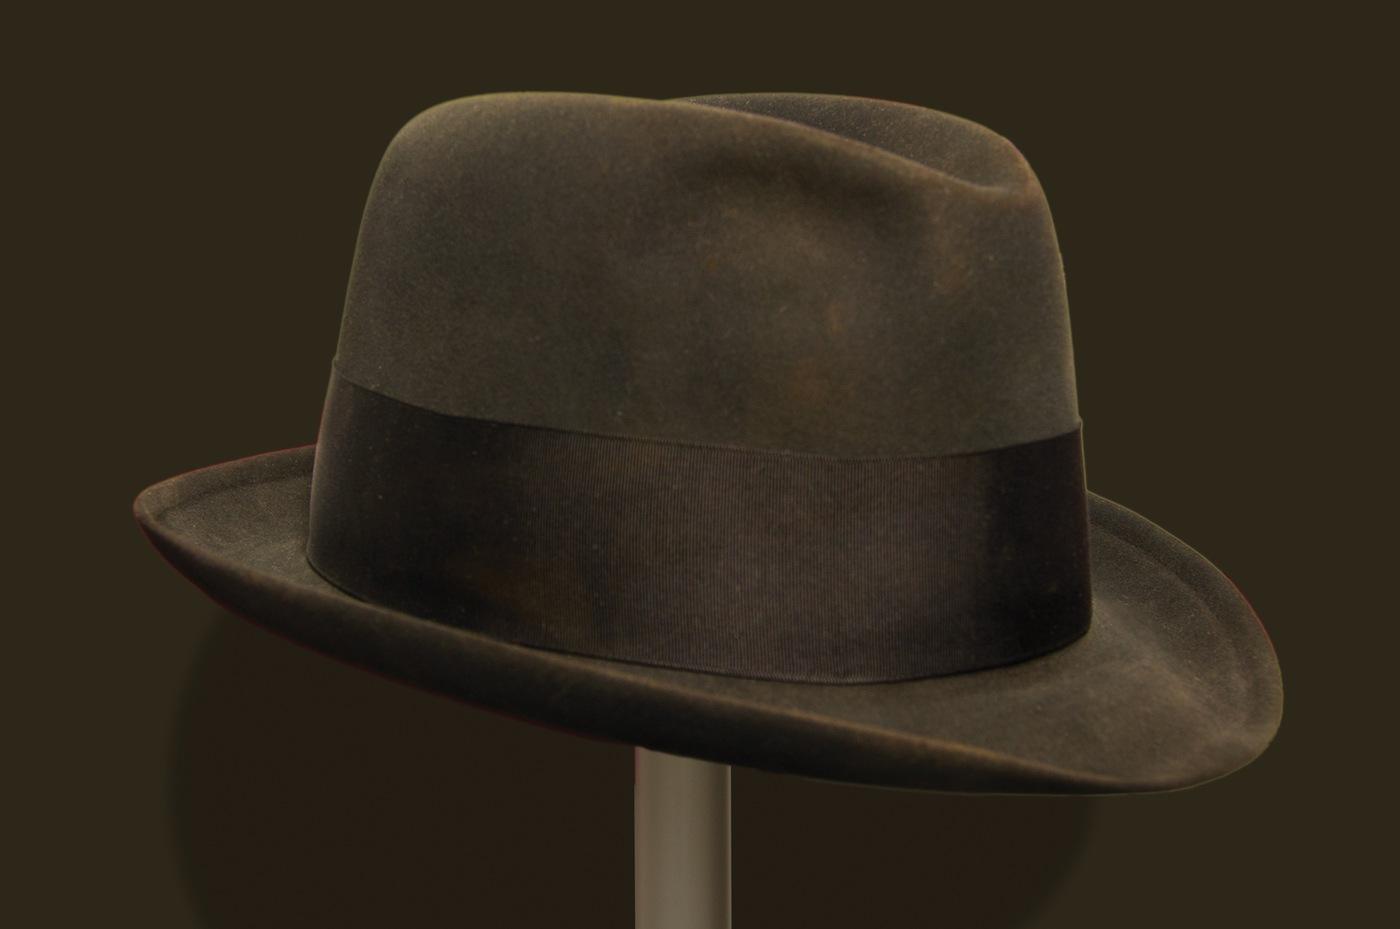 Photo of FBI Director J. Edgar Hoover's fedora.